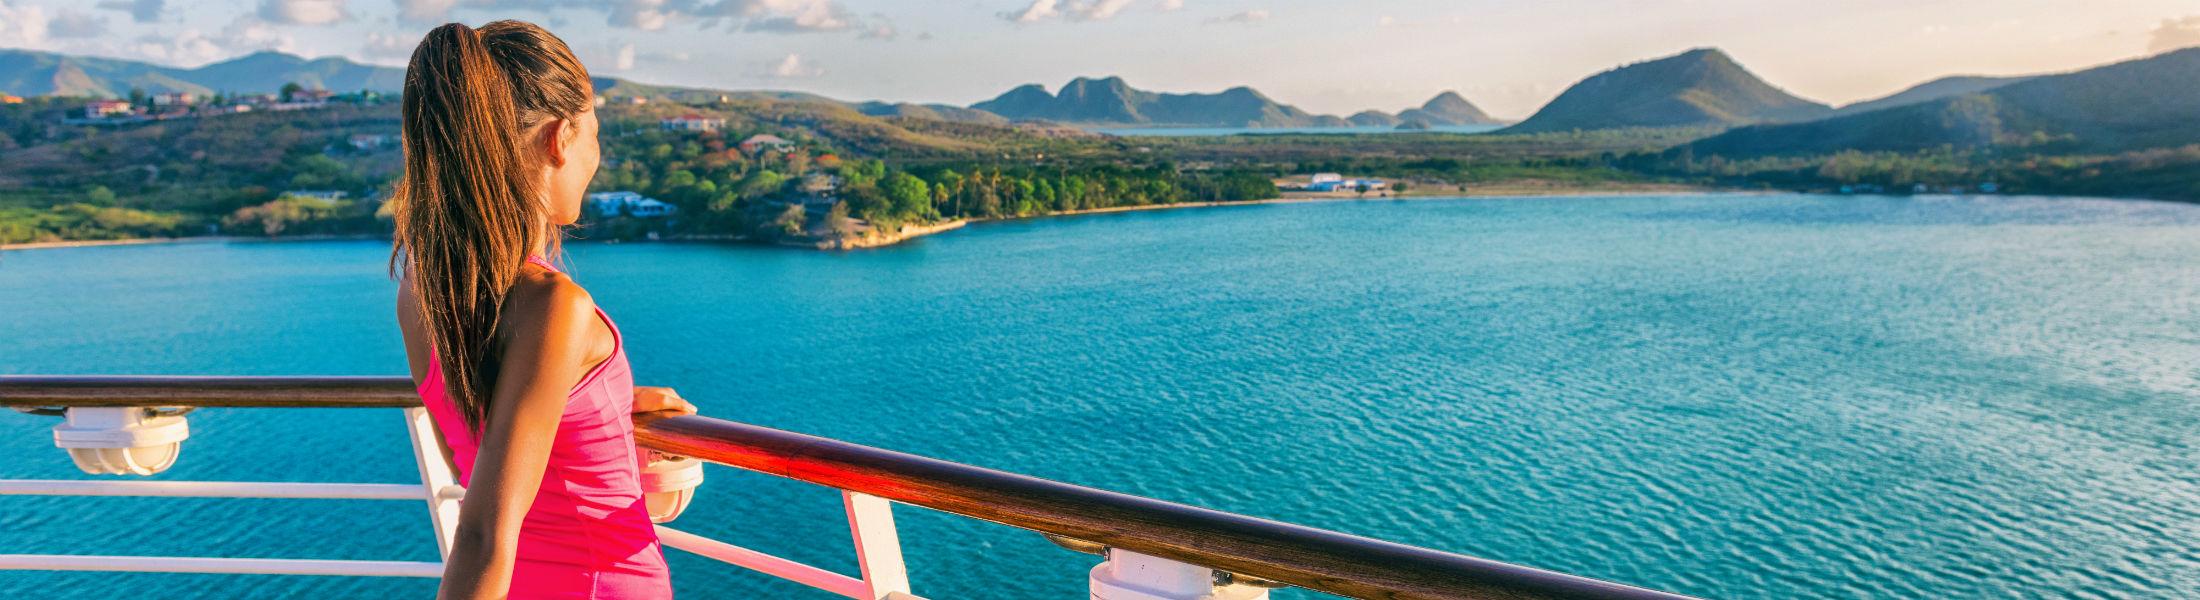 Cruise ship tourist woman